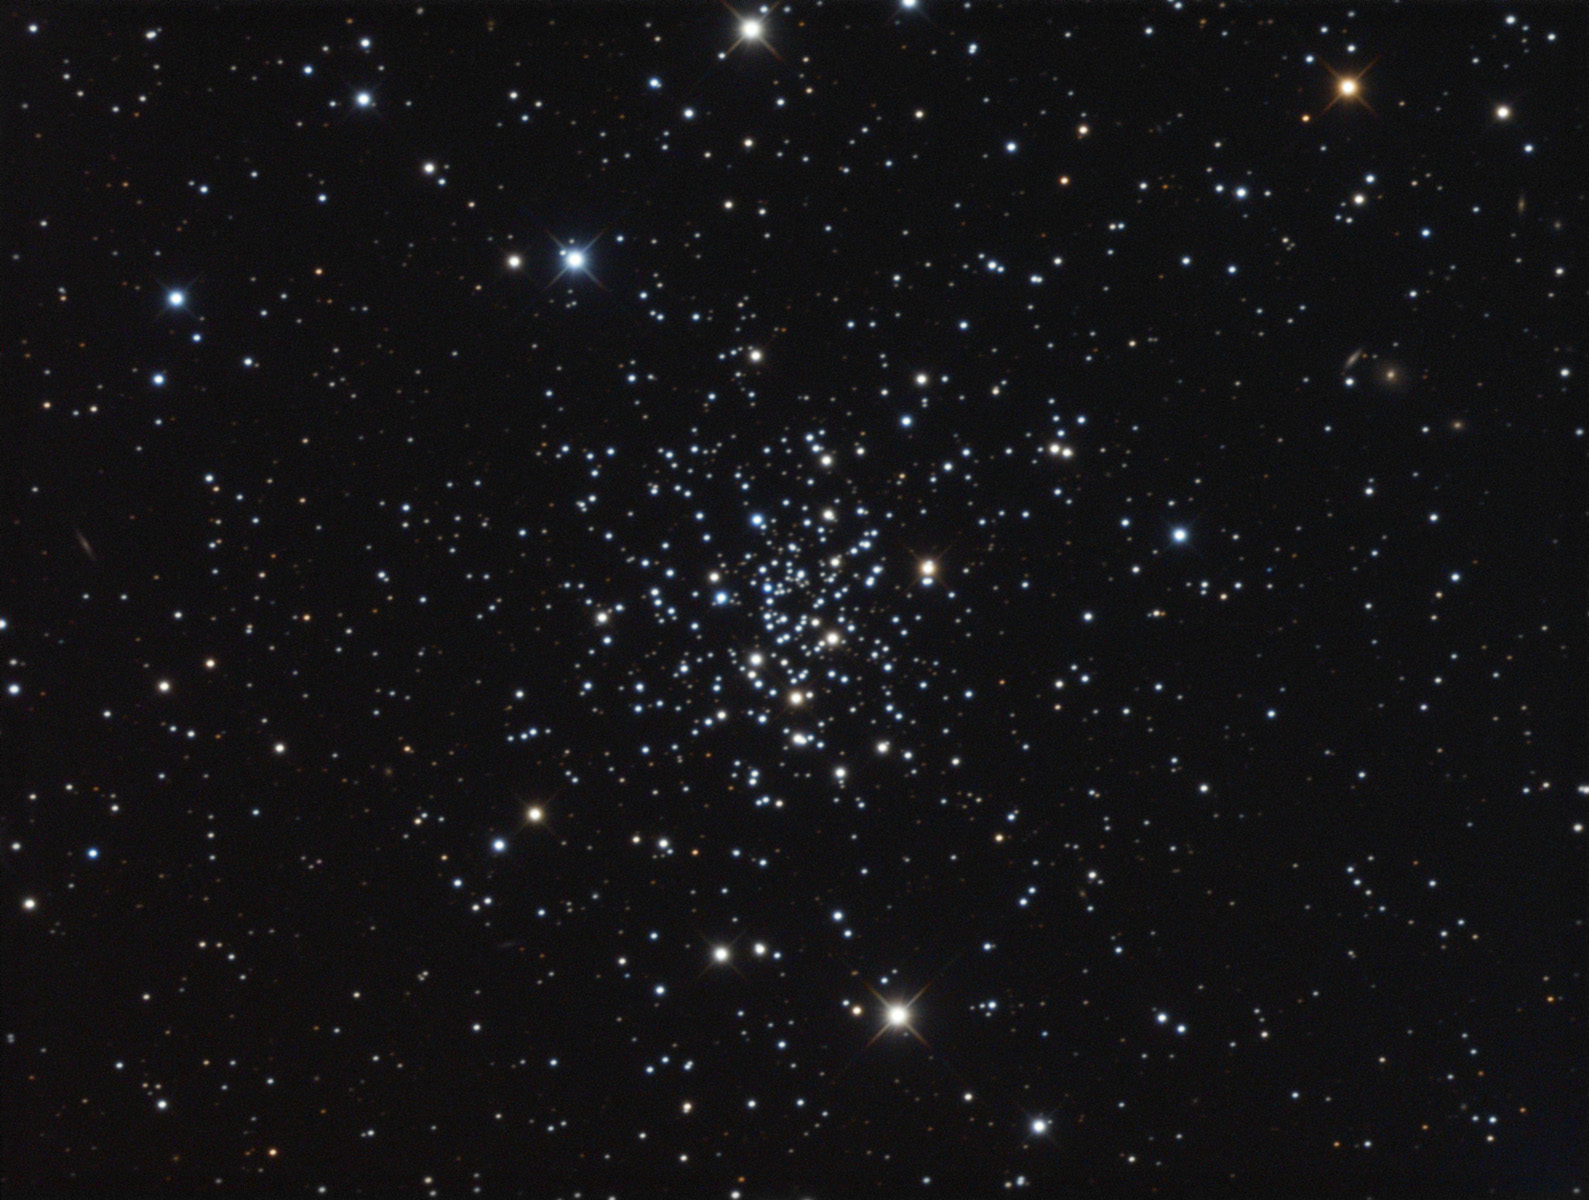 NGC%202420%20-%20CN%20-%20LRGB.jpg